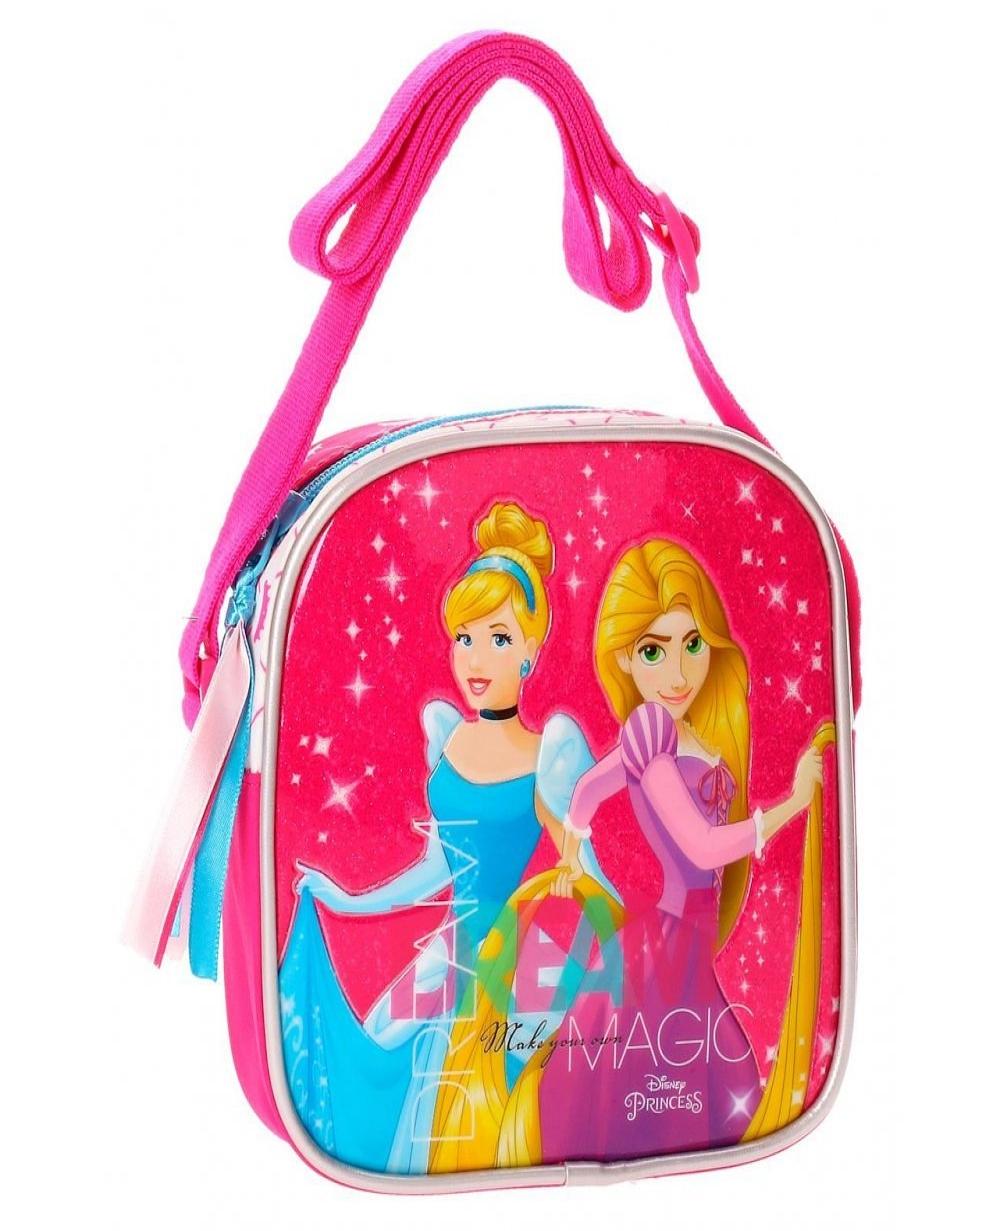 6c947d154 Bandolera Disney Princesas Rosa 15cm | Maletia.com